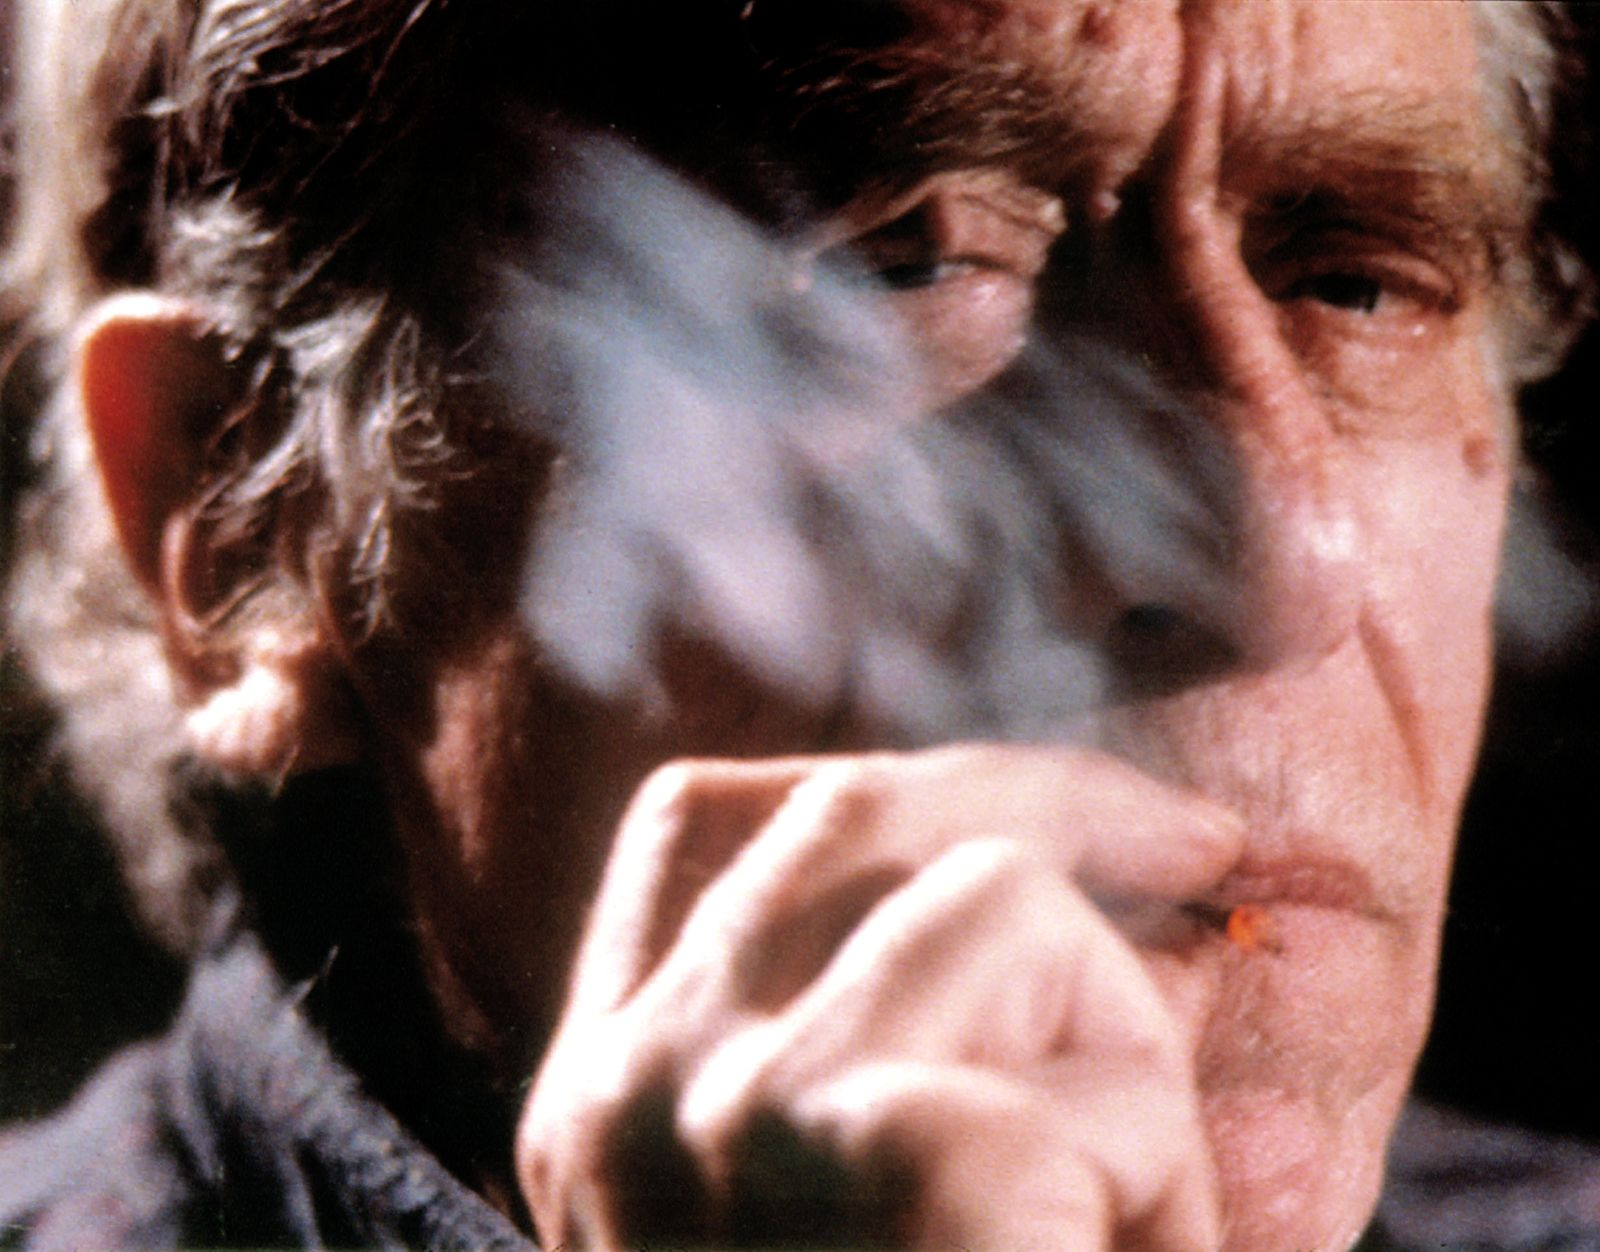 BUKOWSKI: BORN INTO THIS, Charles Bukowski, 2004, (c) Magnolia Pictures/courtesy Everett Collection